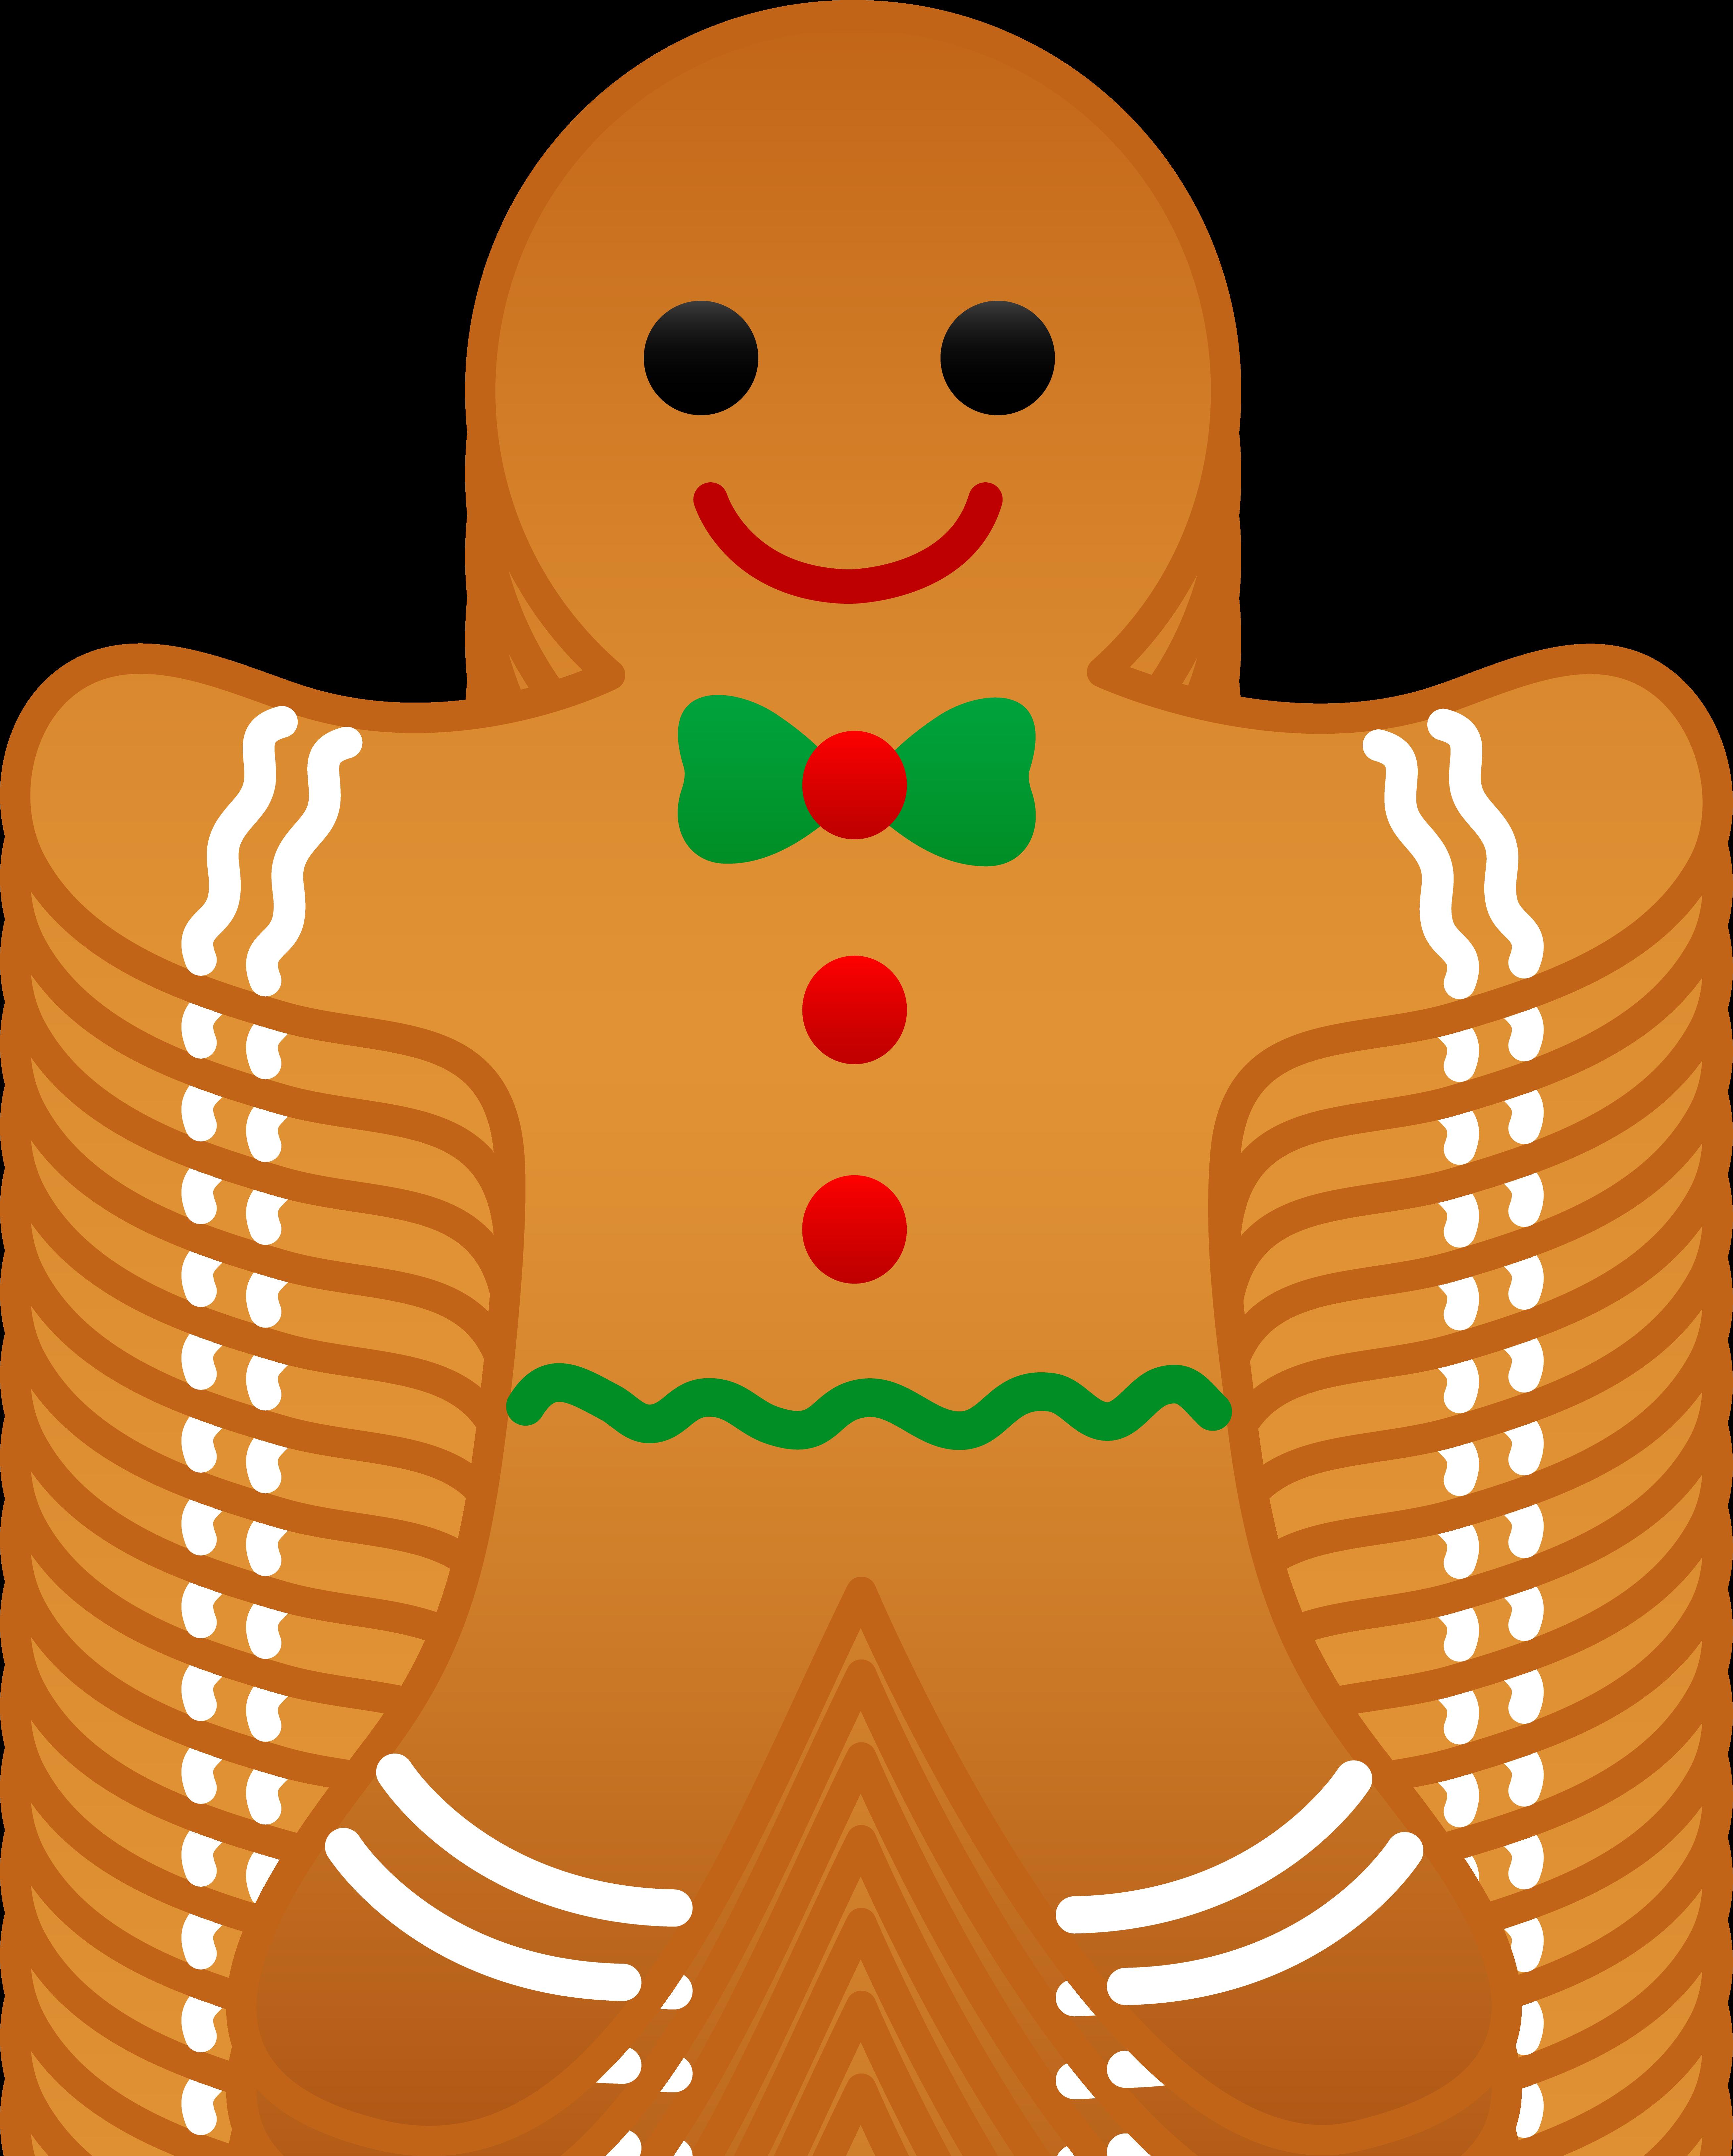 Cookies Clip Artchristmas Gingerbread Man Free Clip Art Bpr3sjis Png